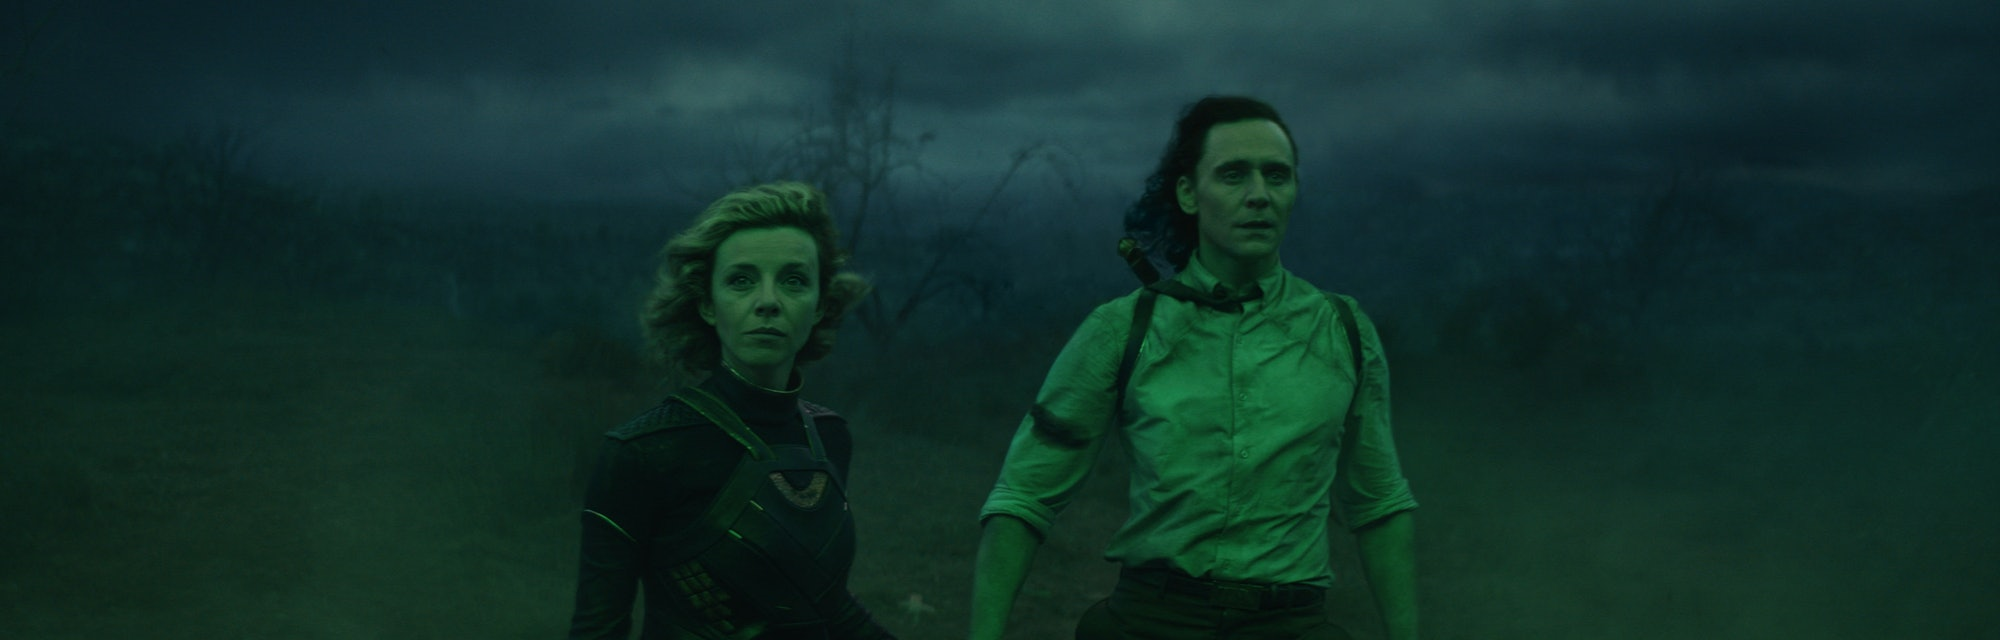 Loki' finale: Episode 6 release date, start time, trailer, spoilers, and  Disney Plus schedule